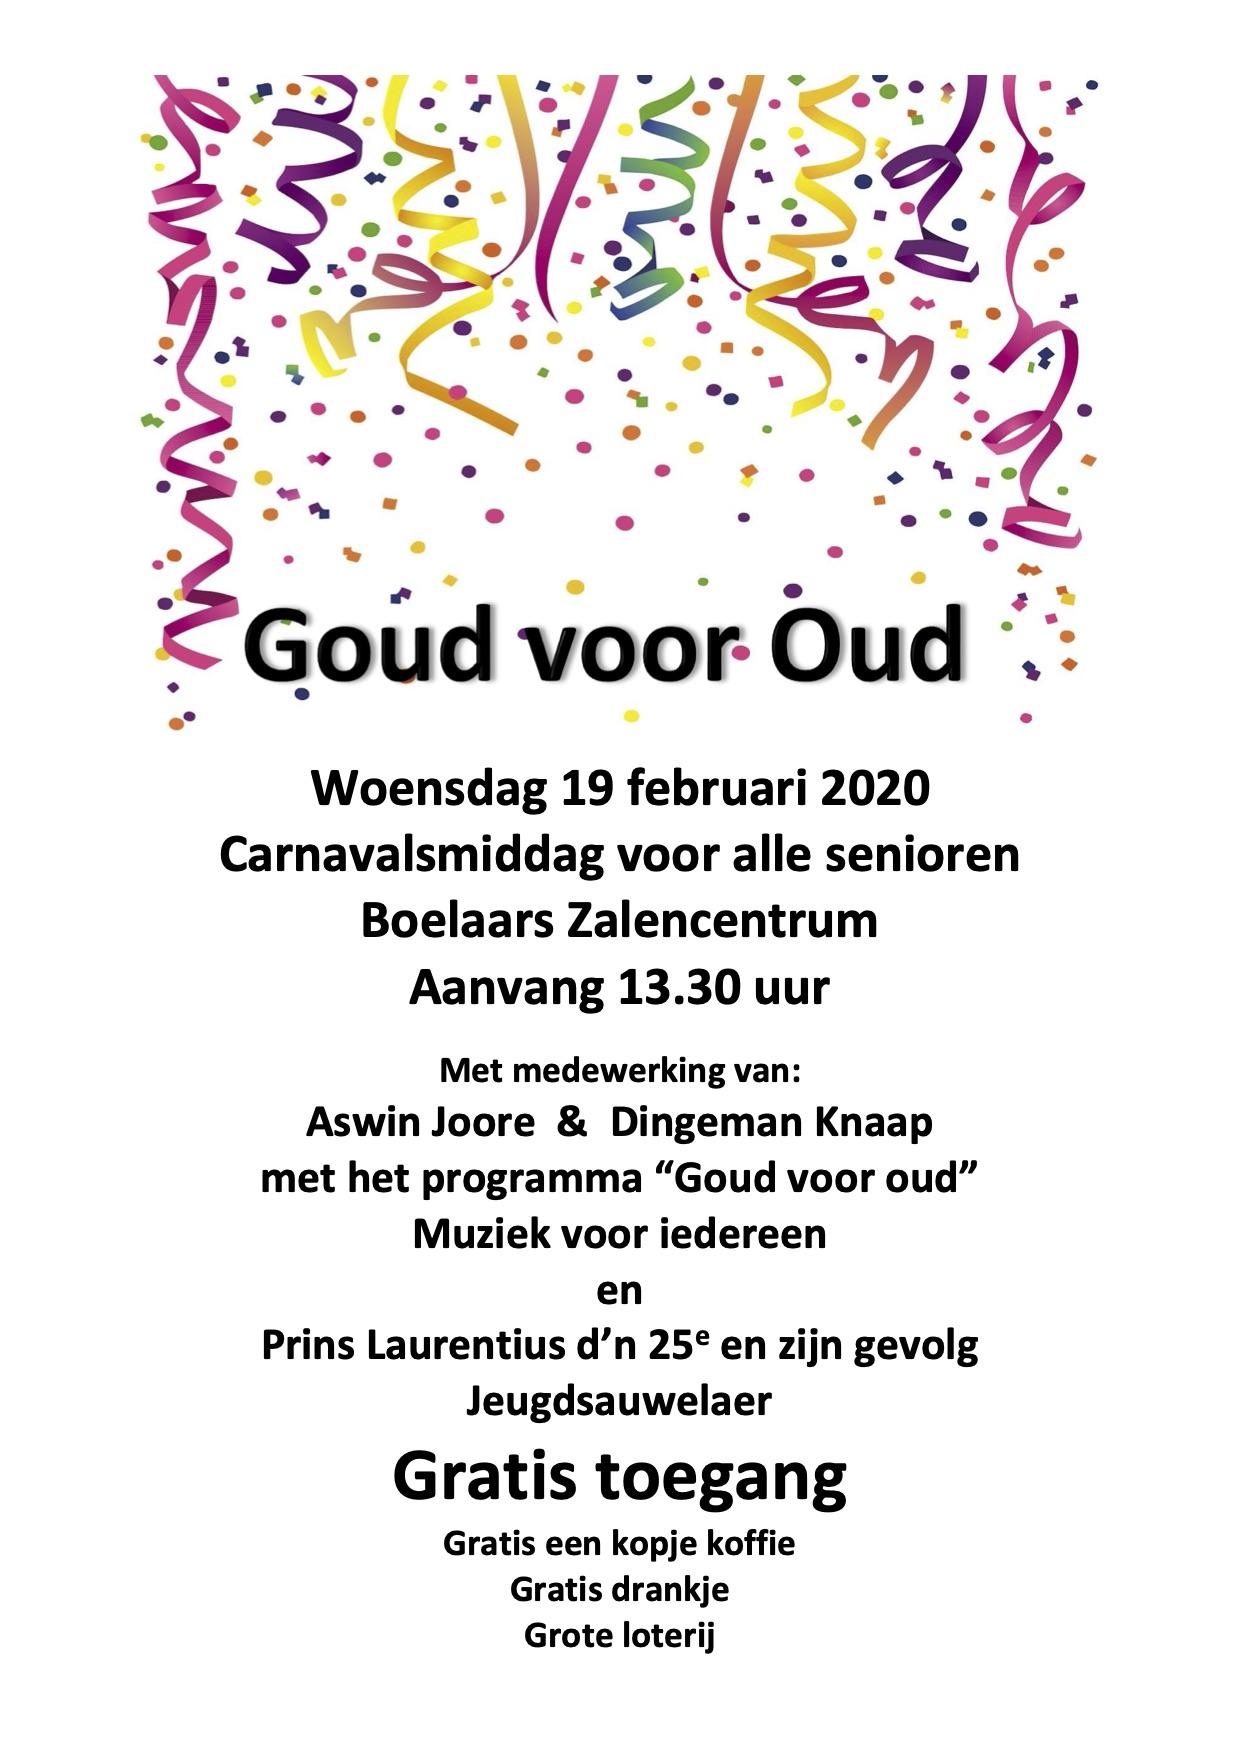 carnaval 2020 poster